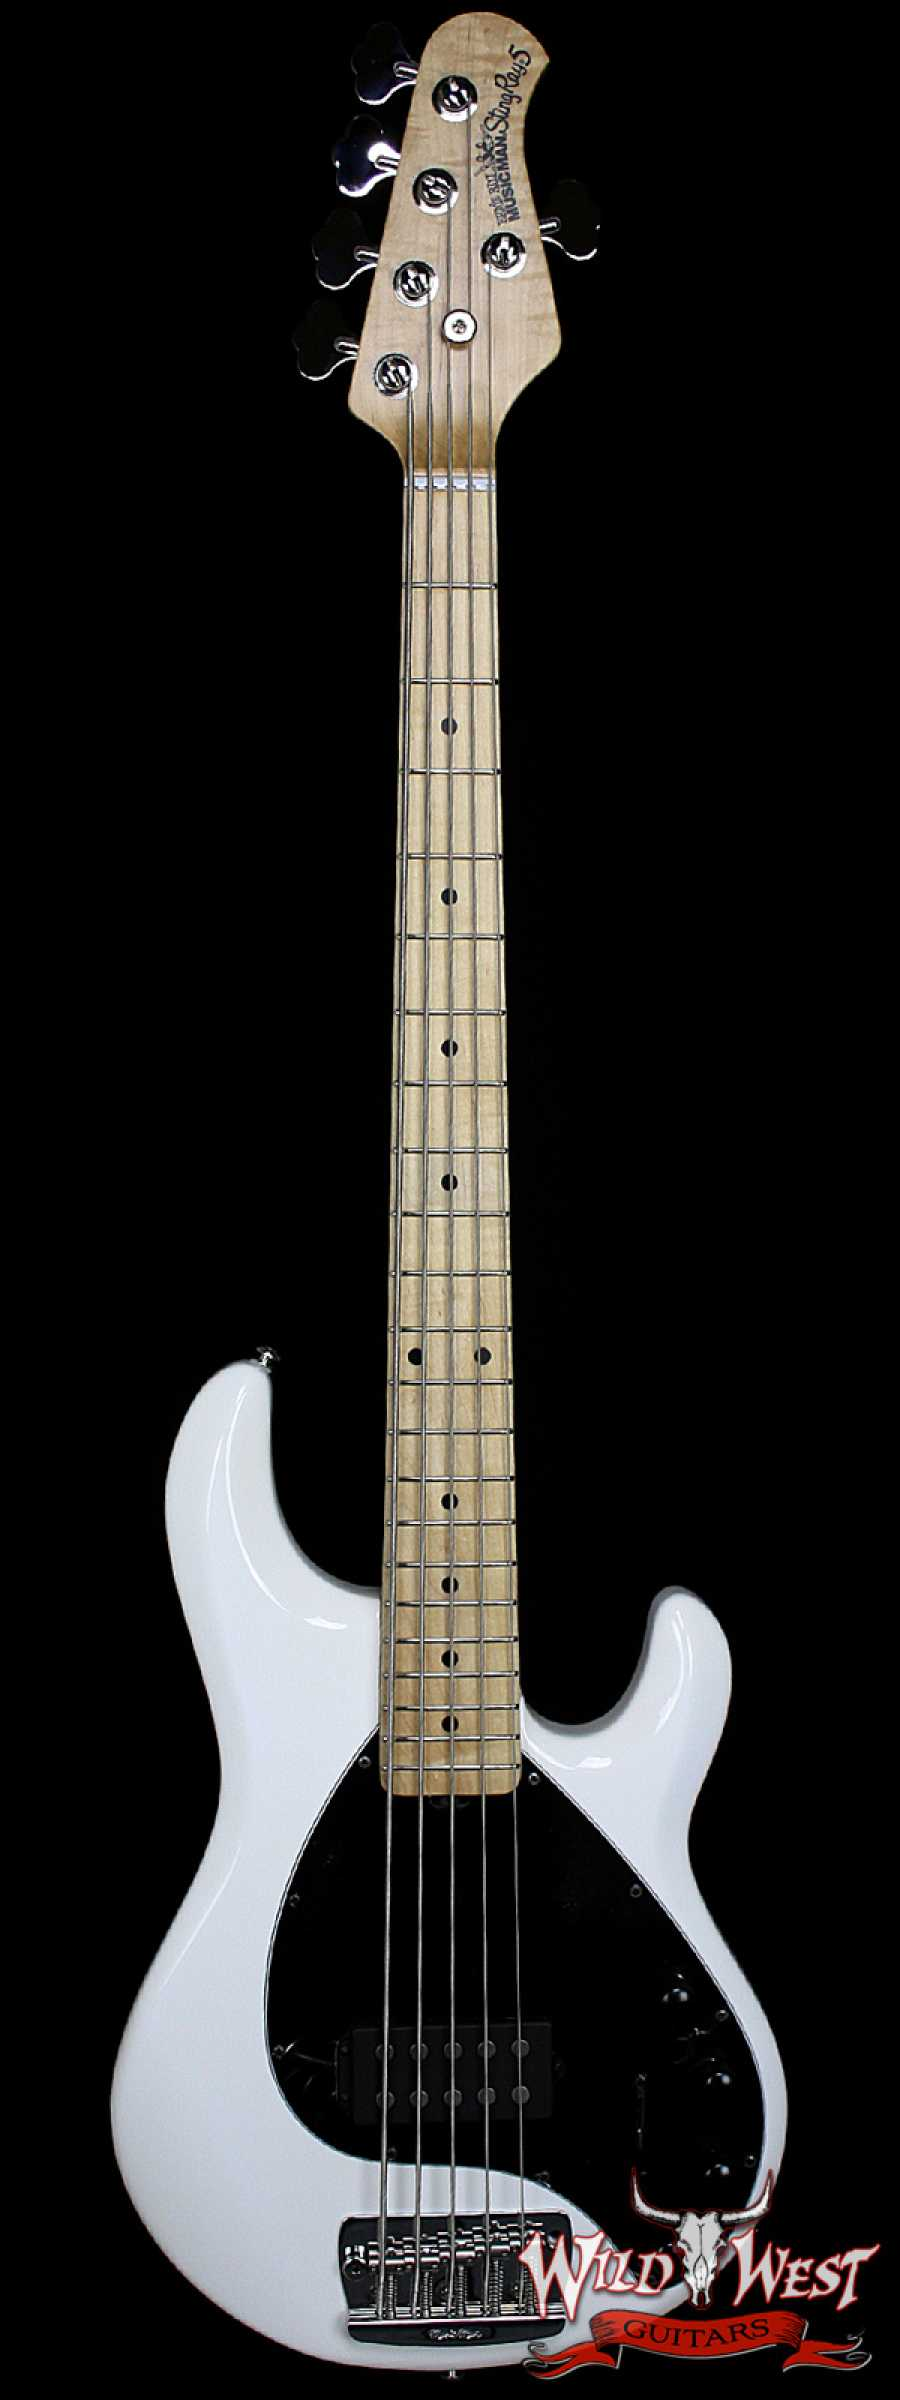 ernie ball music man stingray 5 string bass white wild west guitars. Black Bedroom Furniture Sets. Home Design Ideas